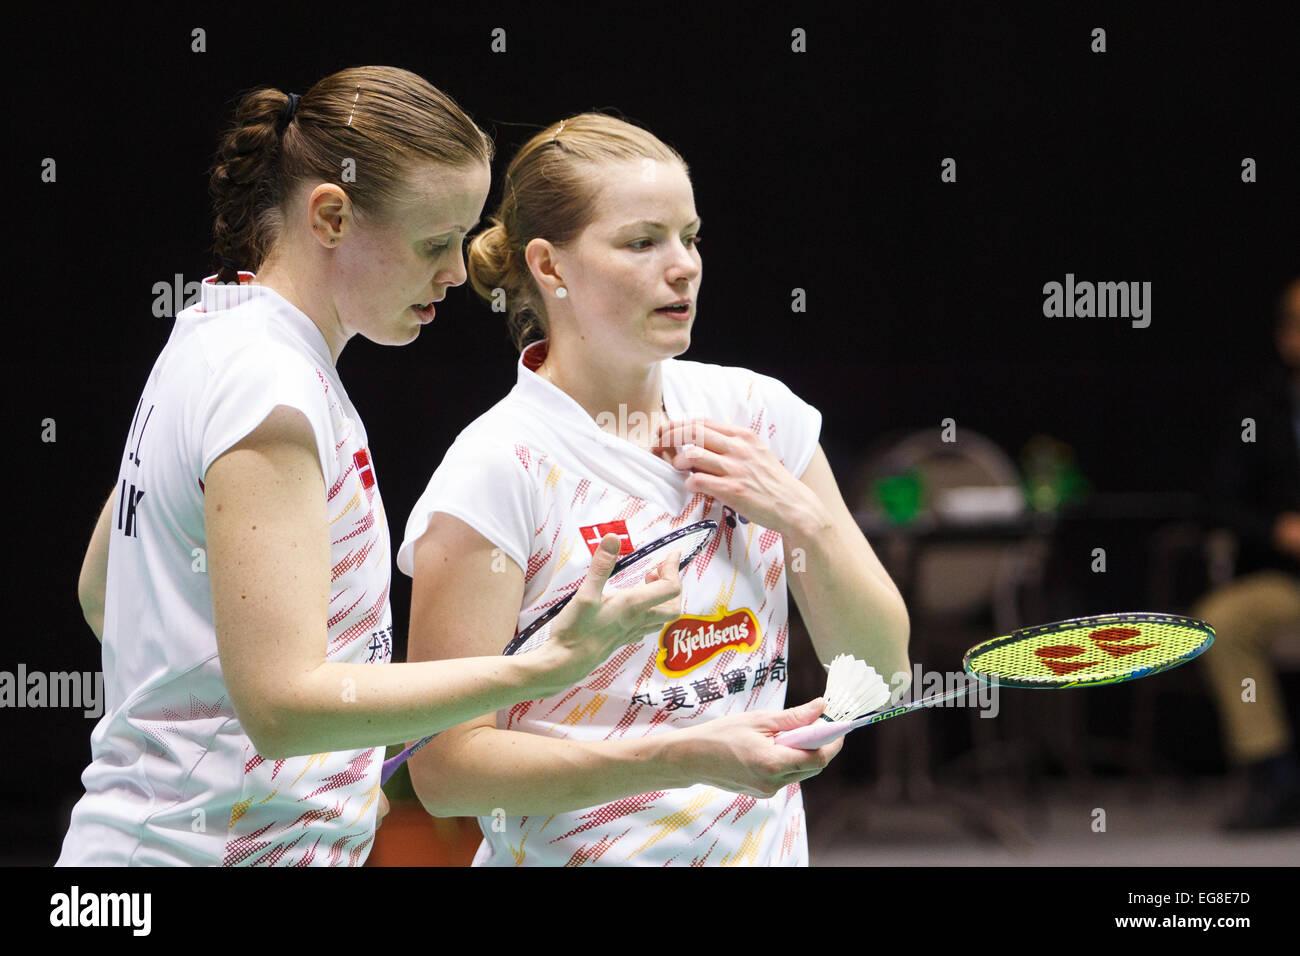 LEUVEN BELGIUM 14 02 2015 Badminton players Kamilla Rytter Juhl